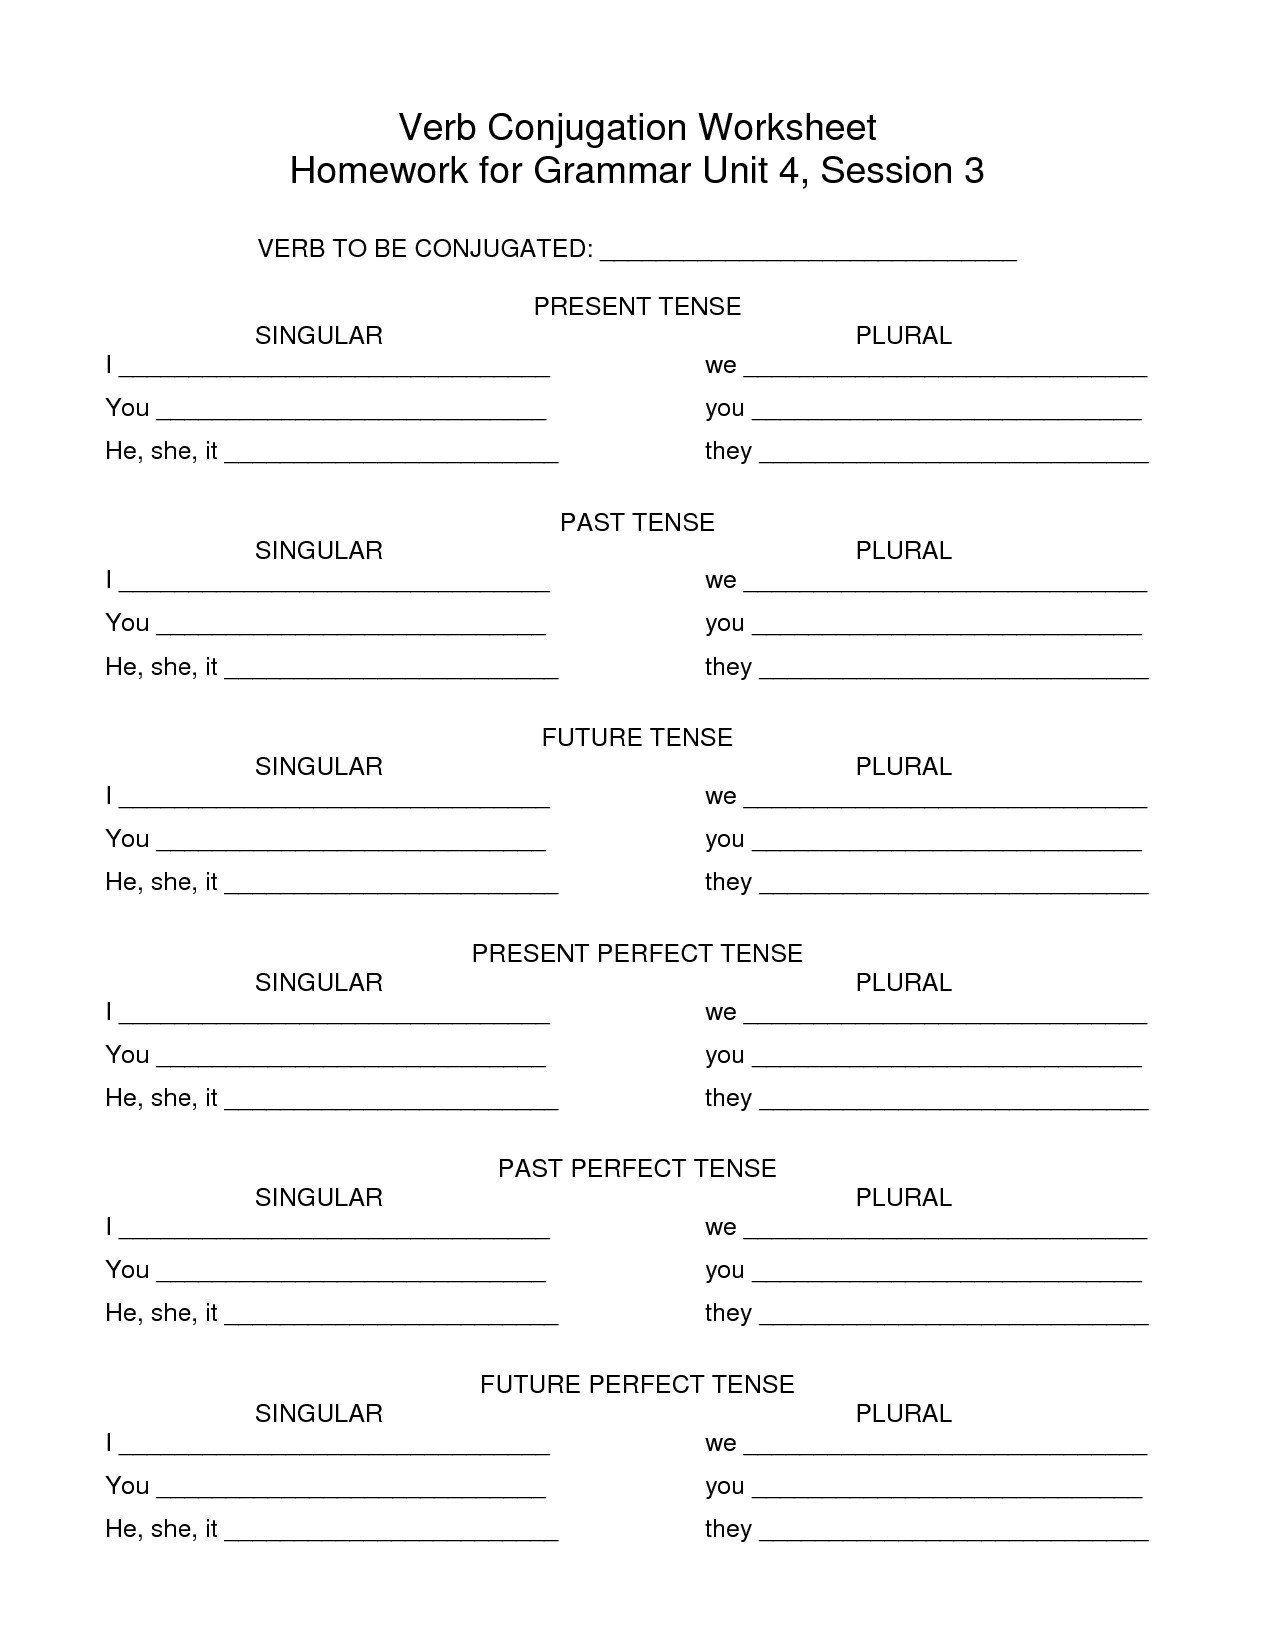 Spanish Verb Conjugation Worksheets Printable Verb